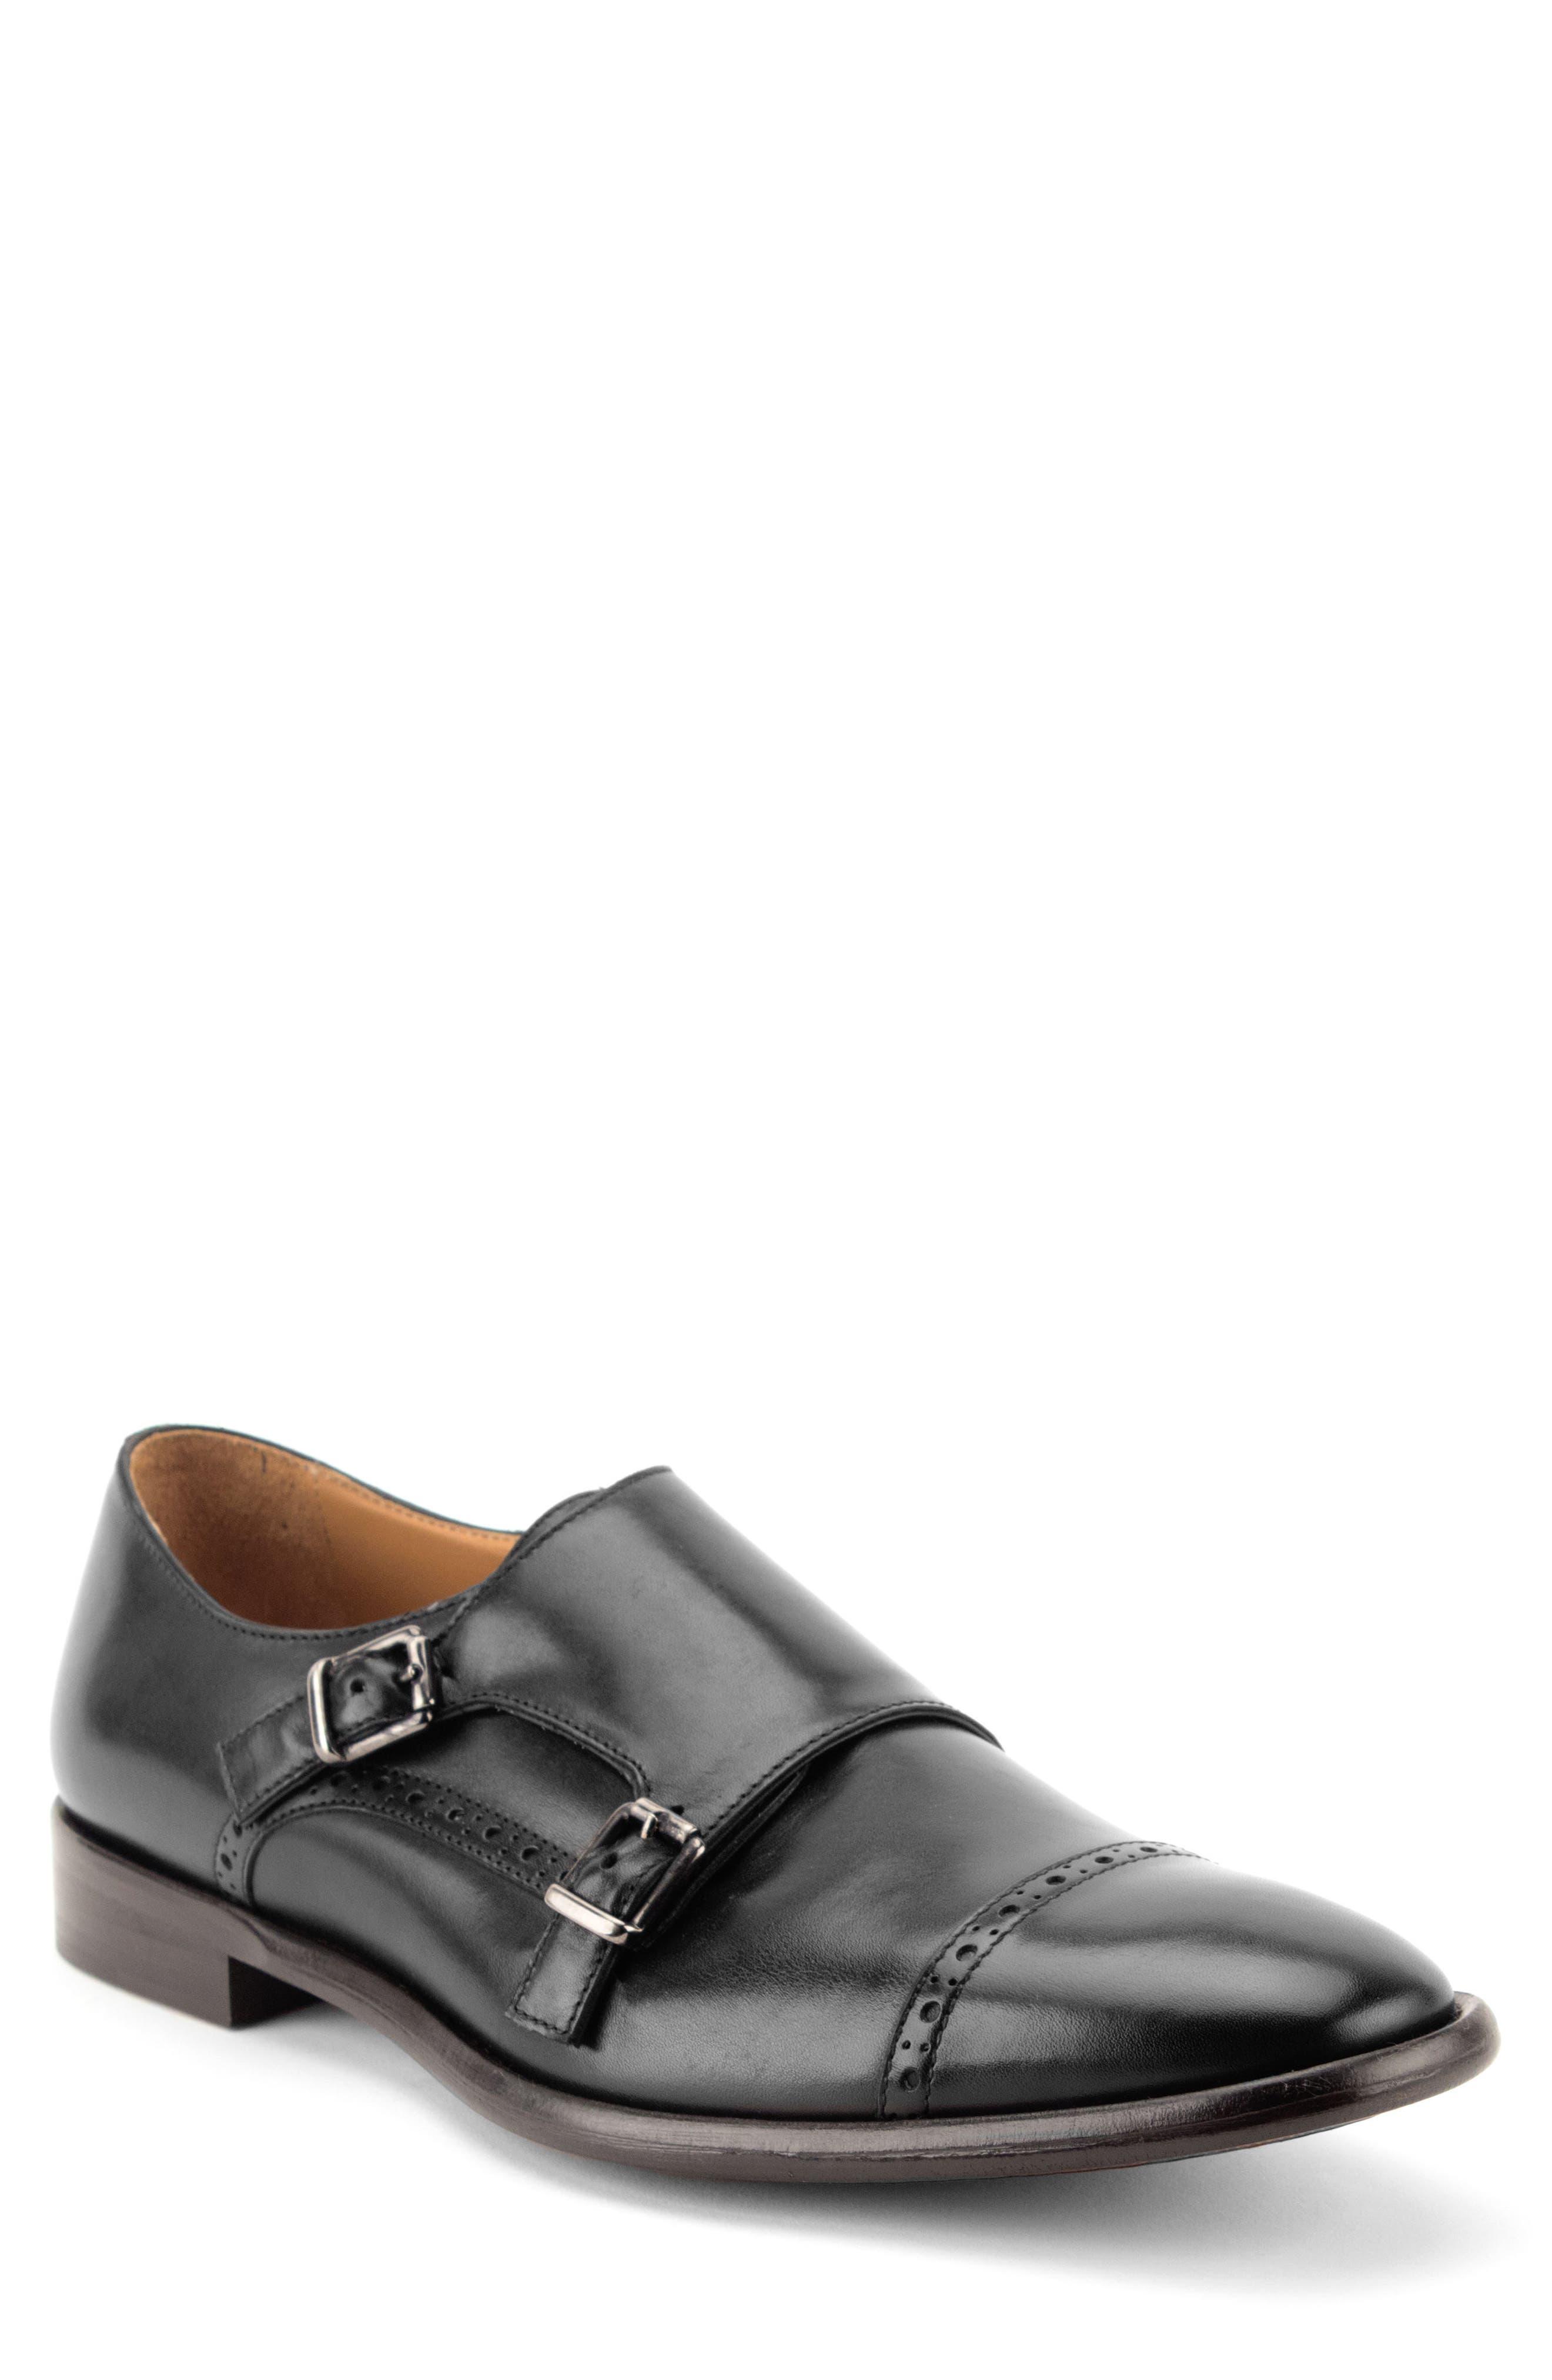 Gordon Rush Corbett Cap Toe Double Strap Monk Shoe (Men)